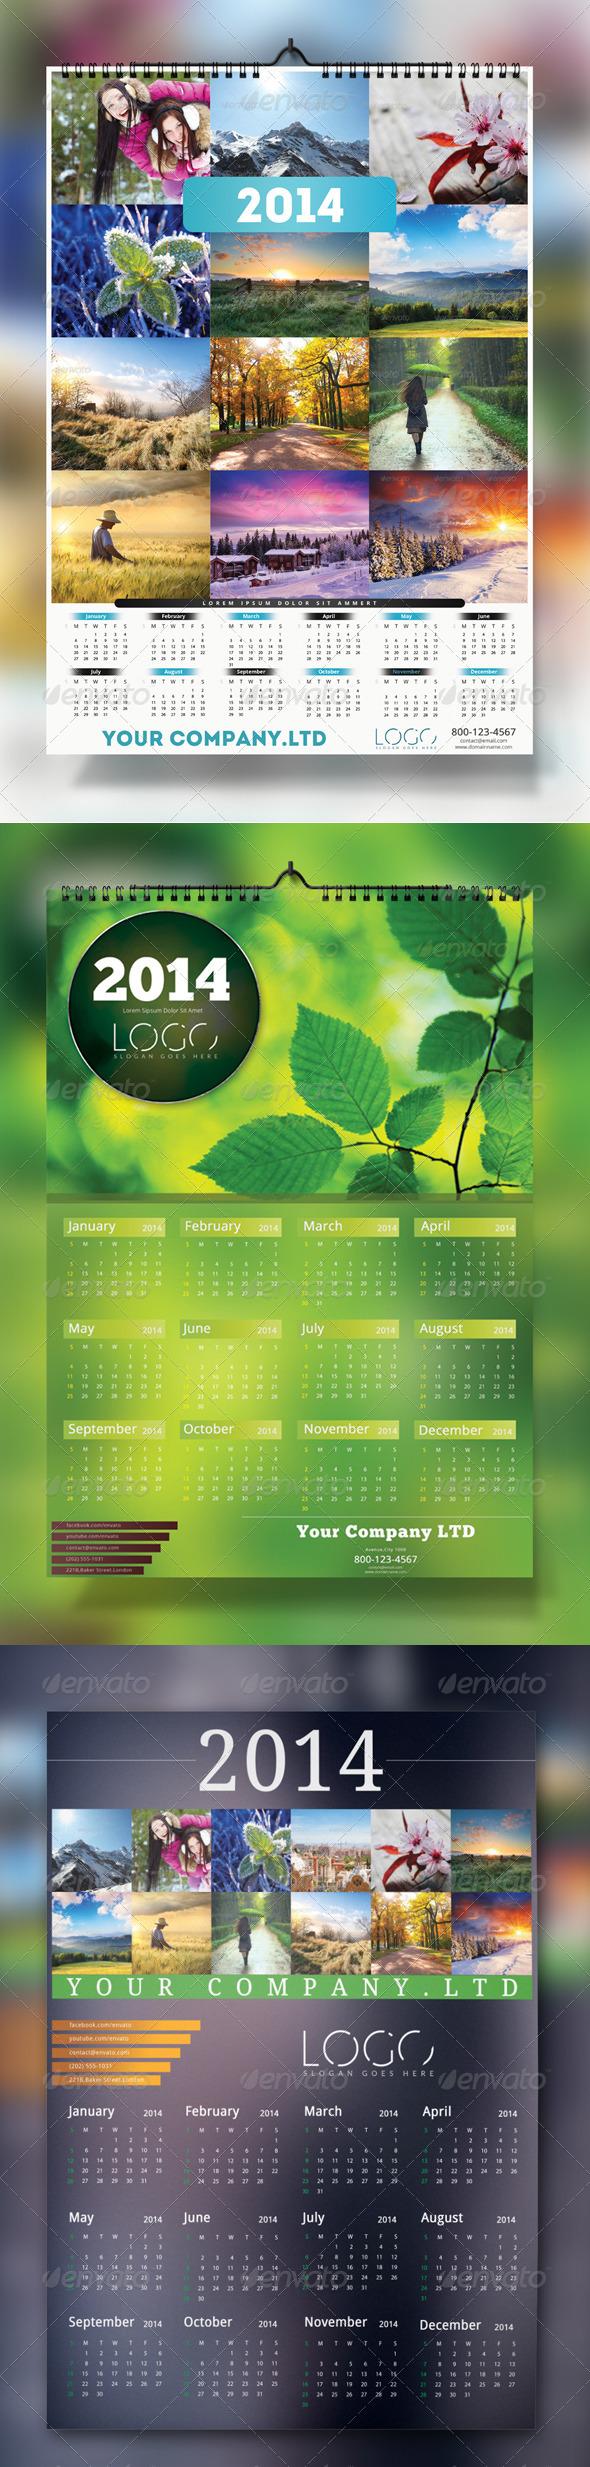 2014 Wall Calendar Bundle